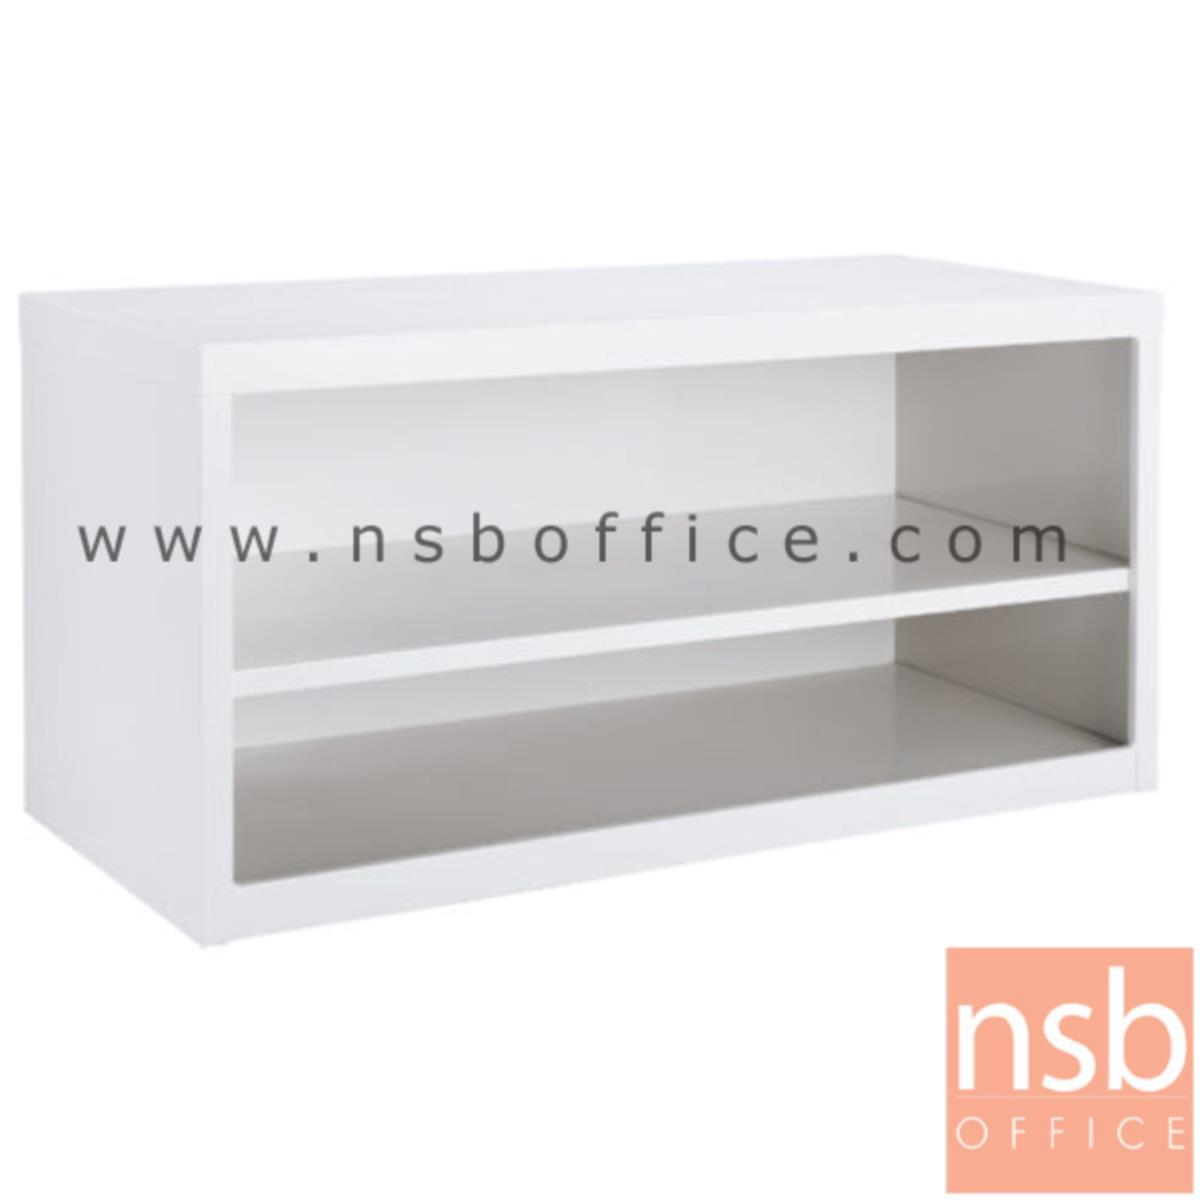 E25A007:ตู้เหล็ก 2 ชั้นโล่ง สีขาวครีม 88W*40.7D*44H cm. รุ่น USB-3